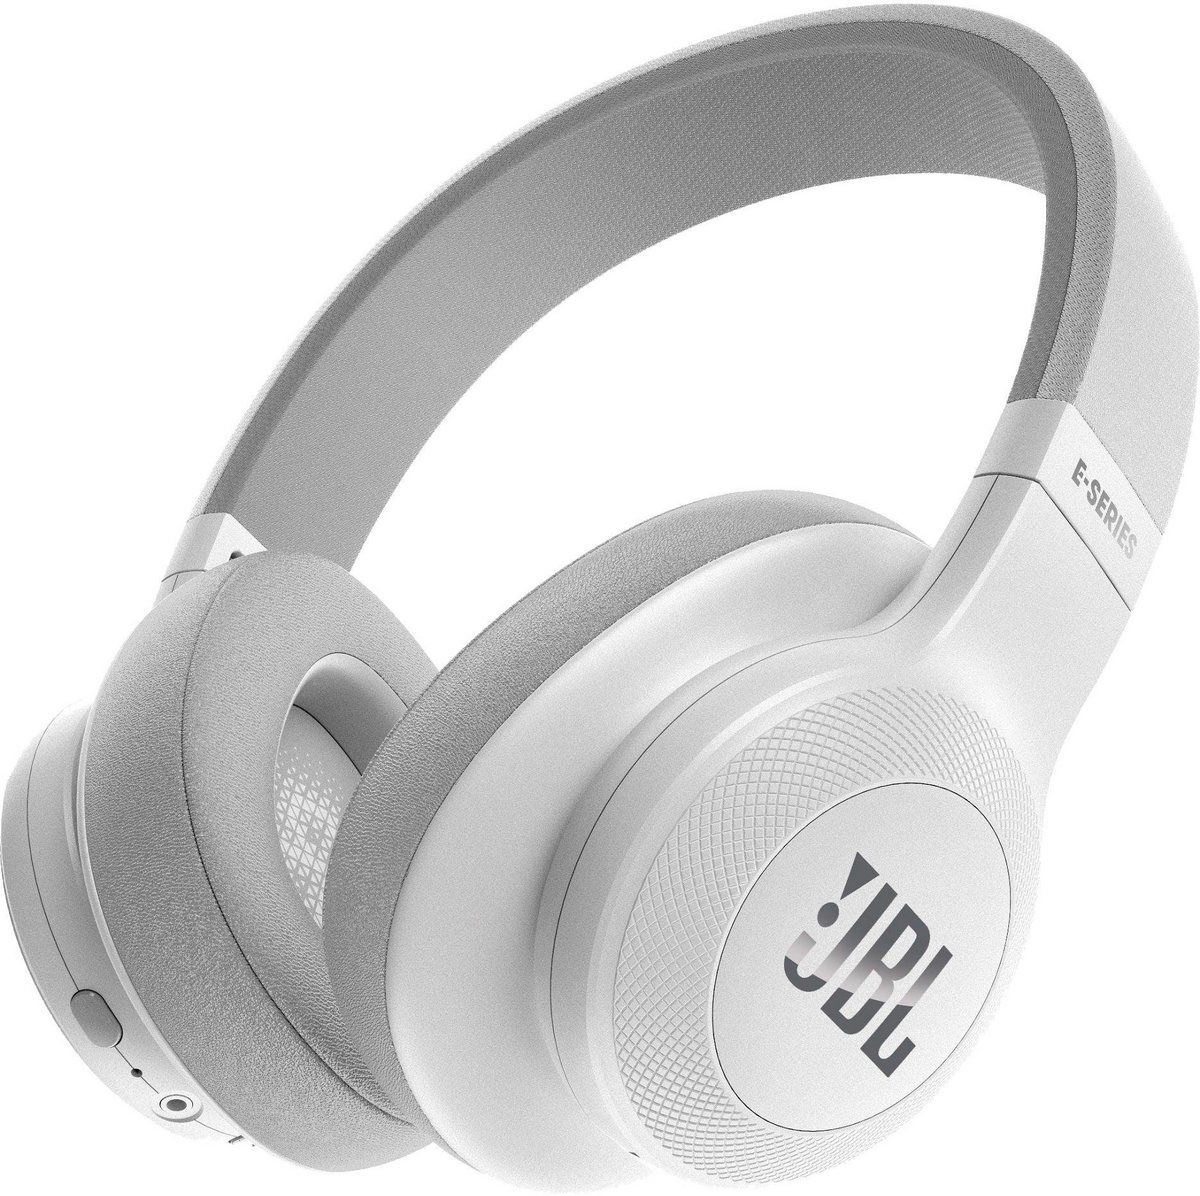 E55bt Over Ear Kopfhorer Bluetooth Over Ear Kopfhorer Bluetooth Bluetooth Kopfhorer Sport